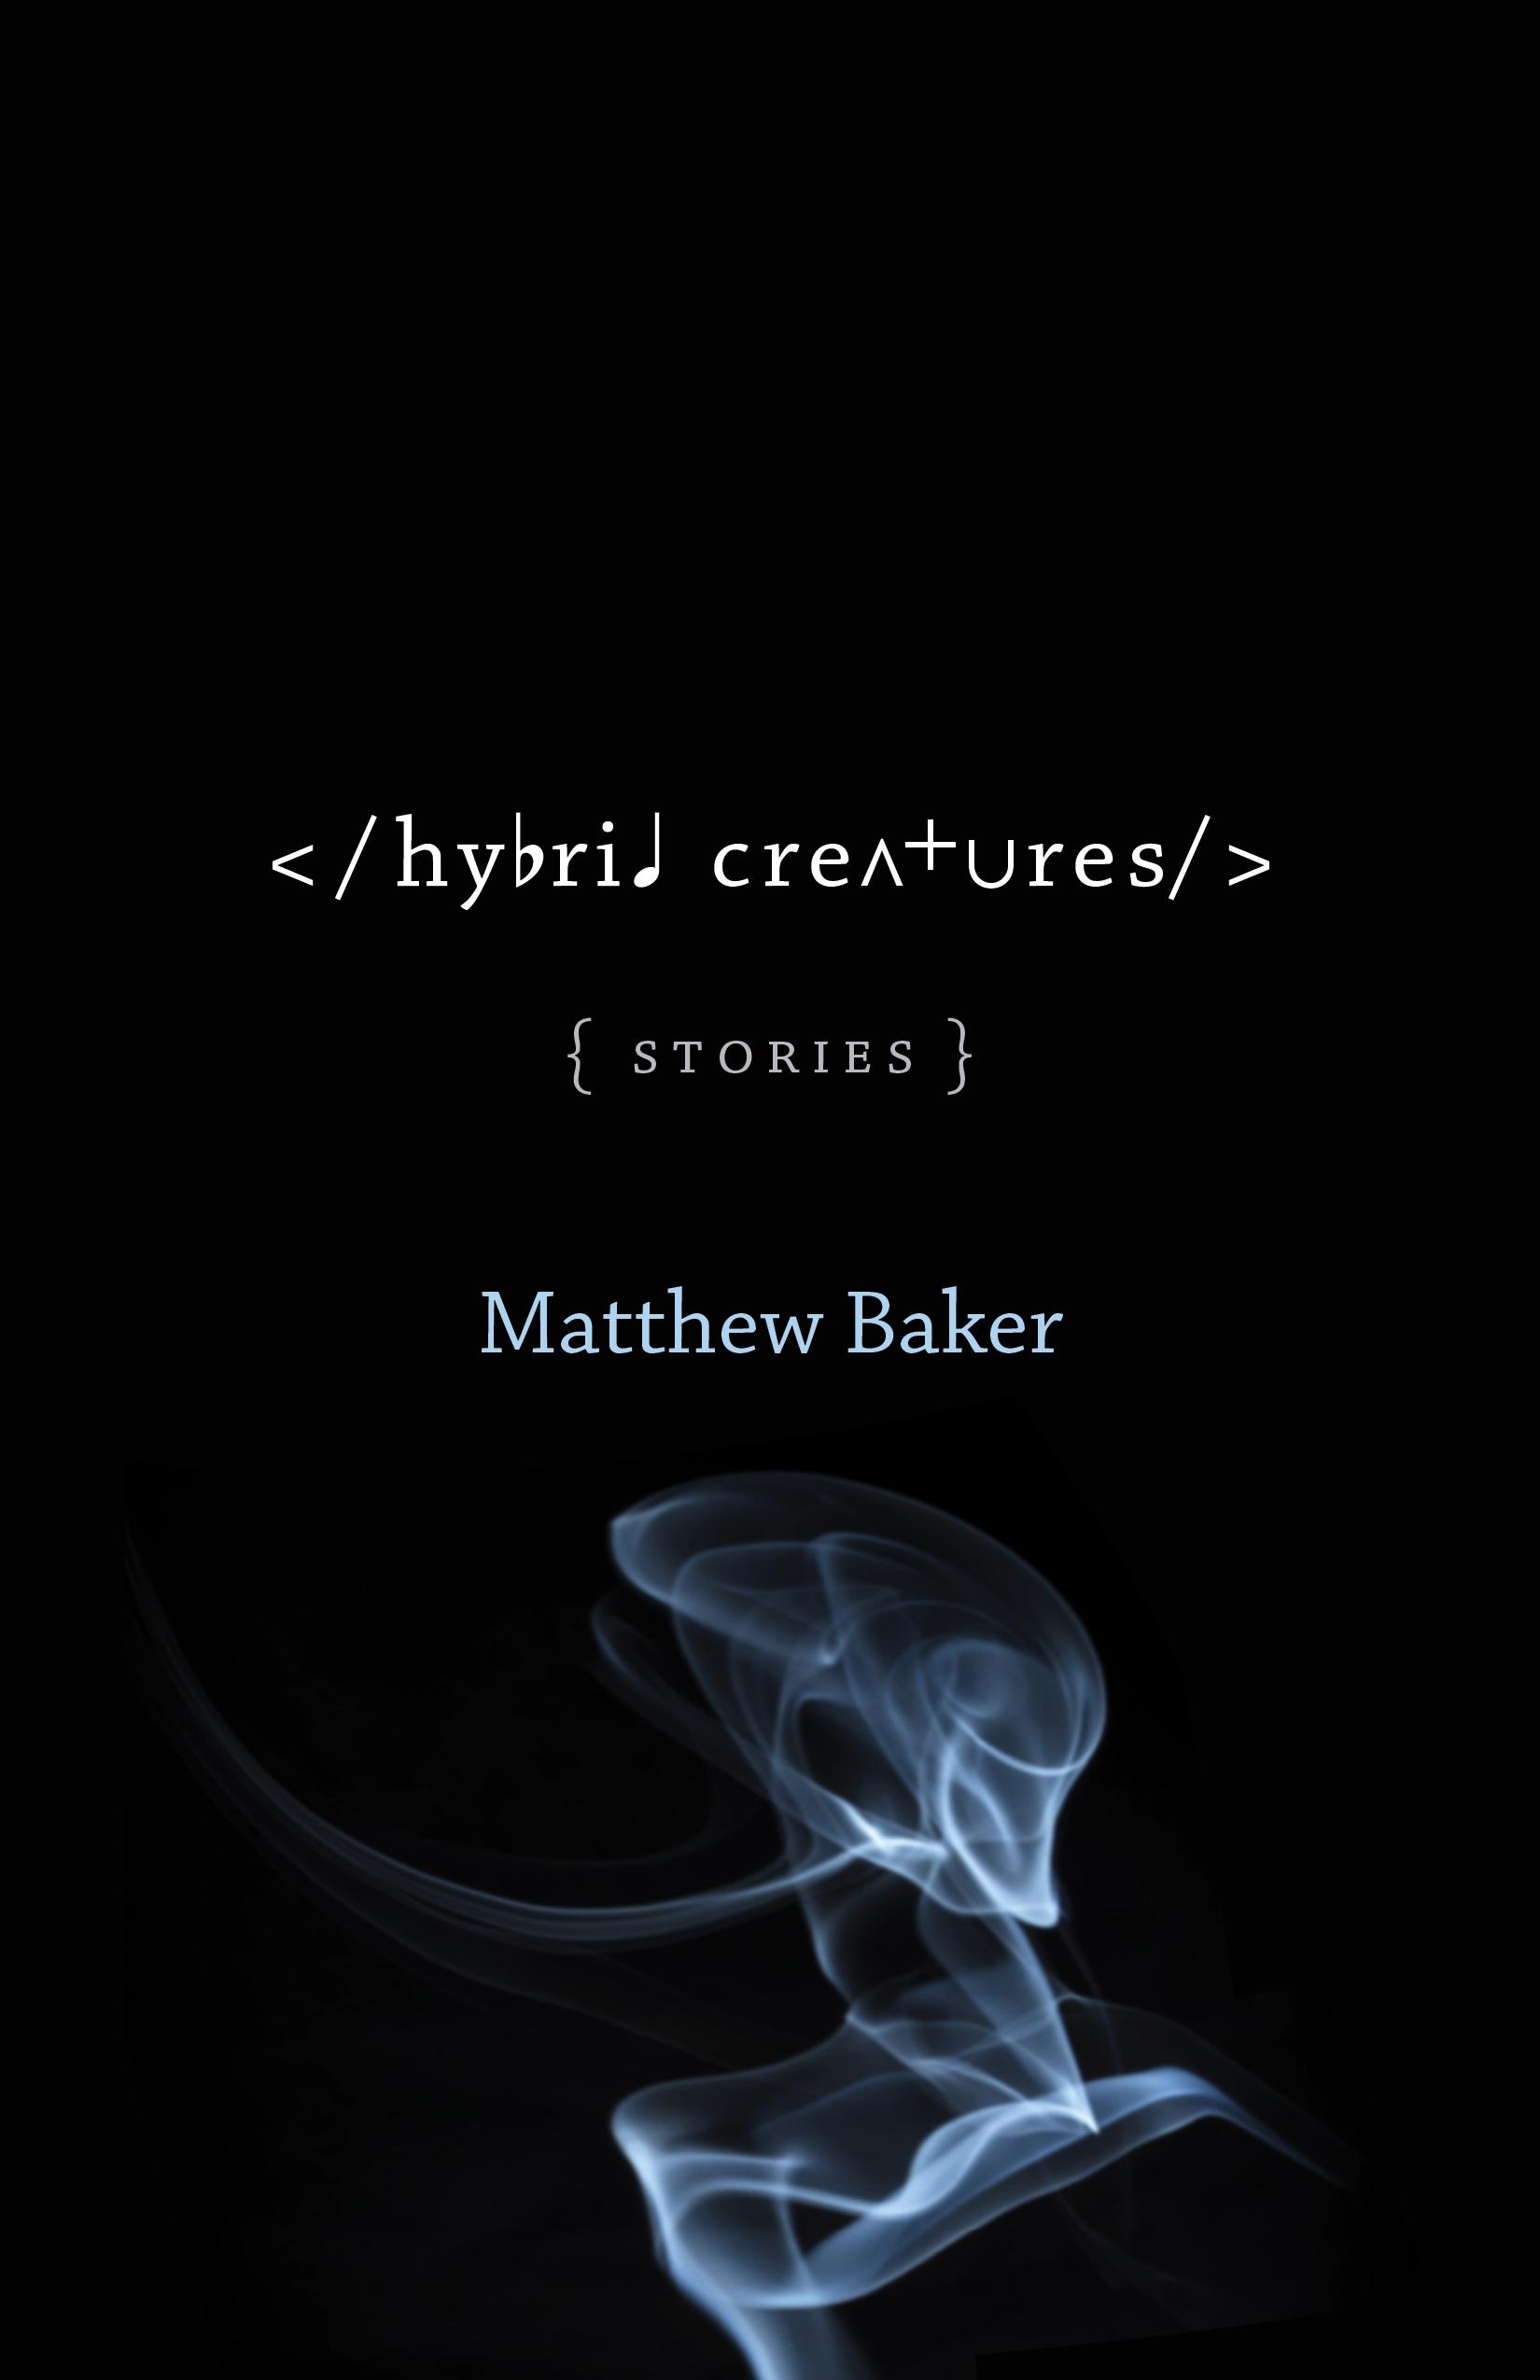 Hybrid Creatures by Matthew Baker - Publication date: February 18, 2018Publisher: LSU PressAuthor Website: mwektaehtabr.comBUY